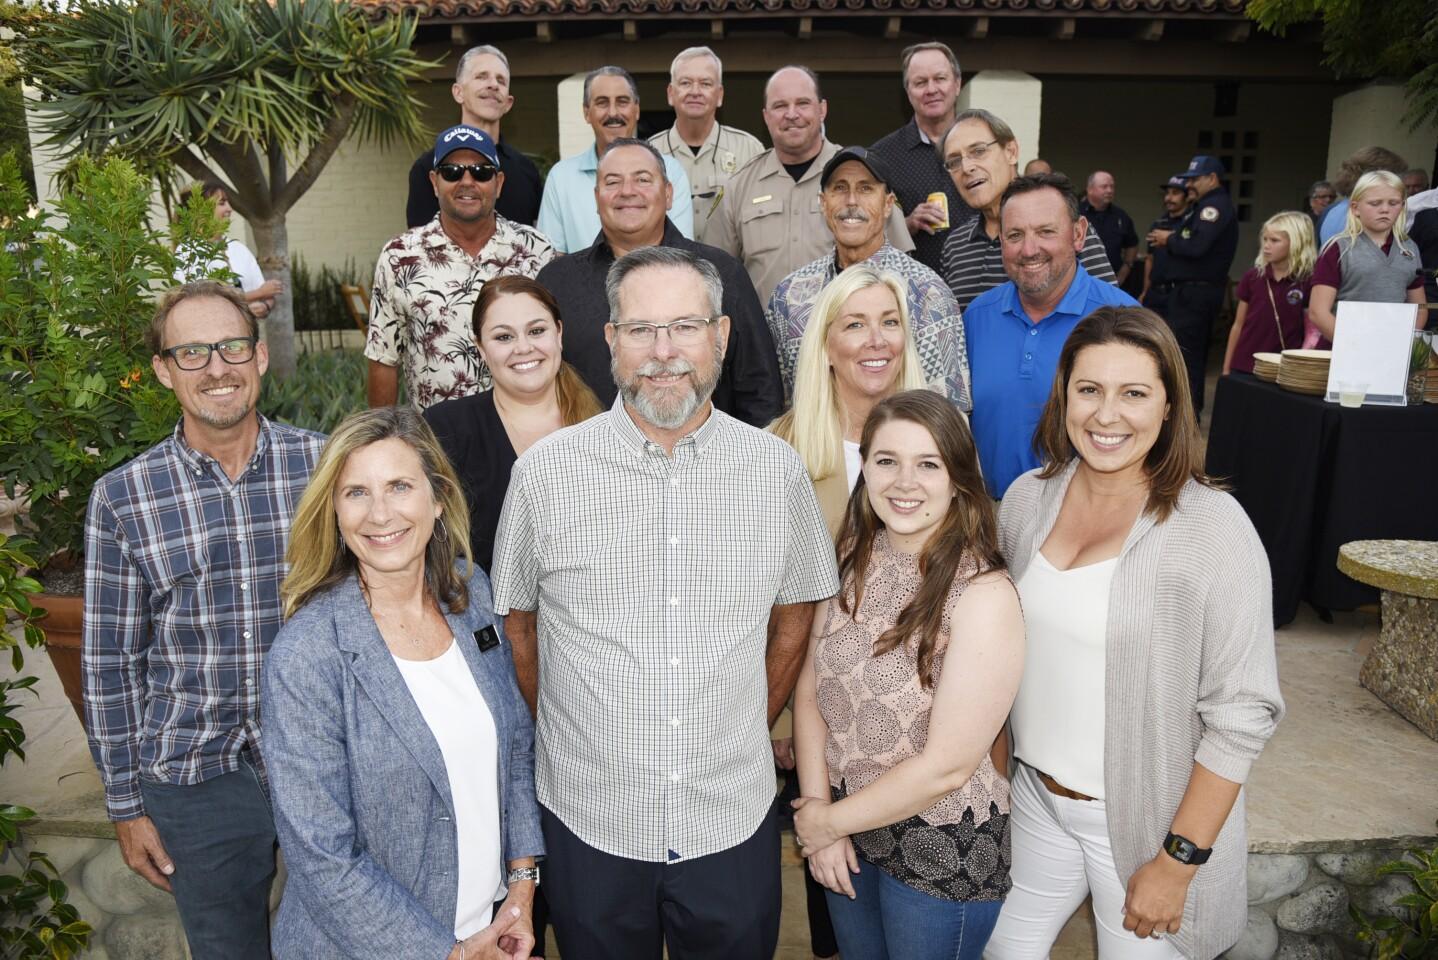 Retiring RSF Patrol Chief Matt Wellhouser (center) and the Rancho Santa Fe Association team